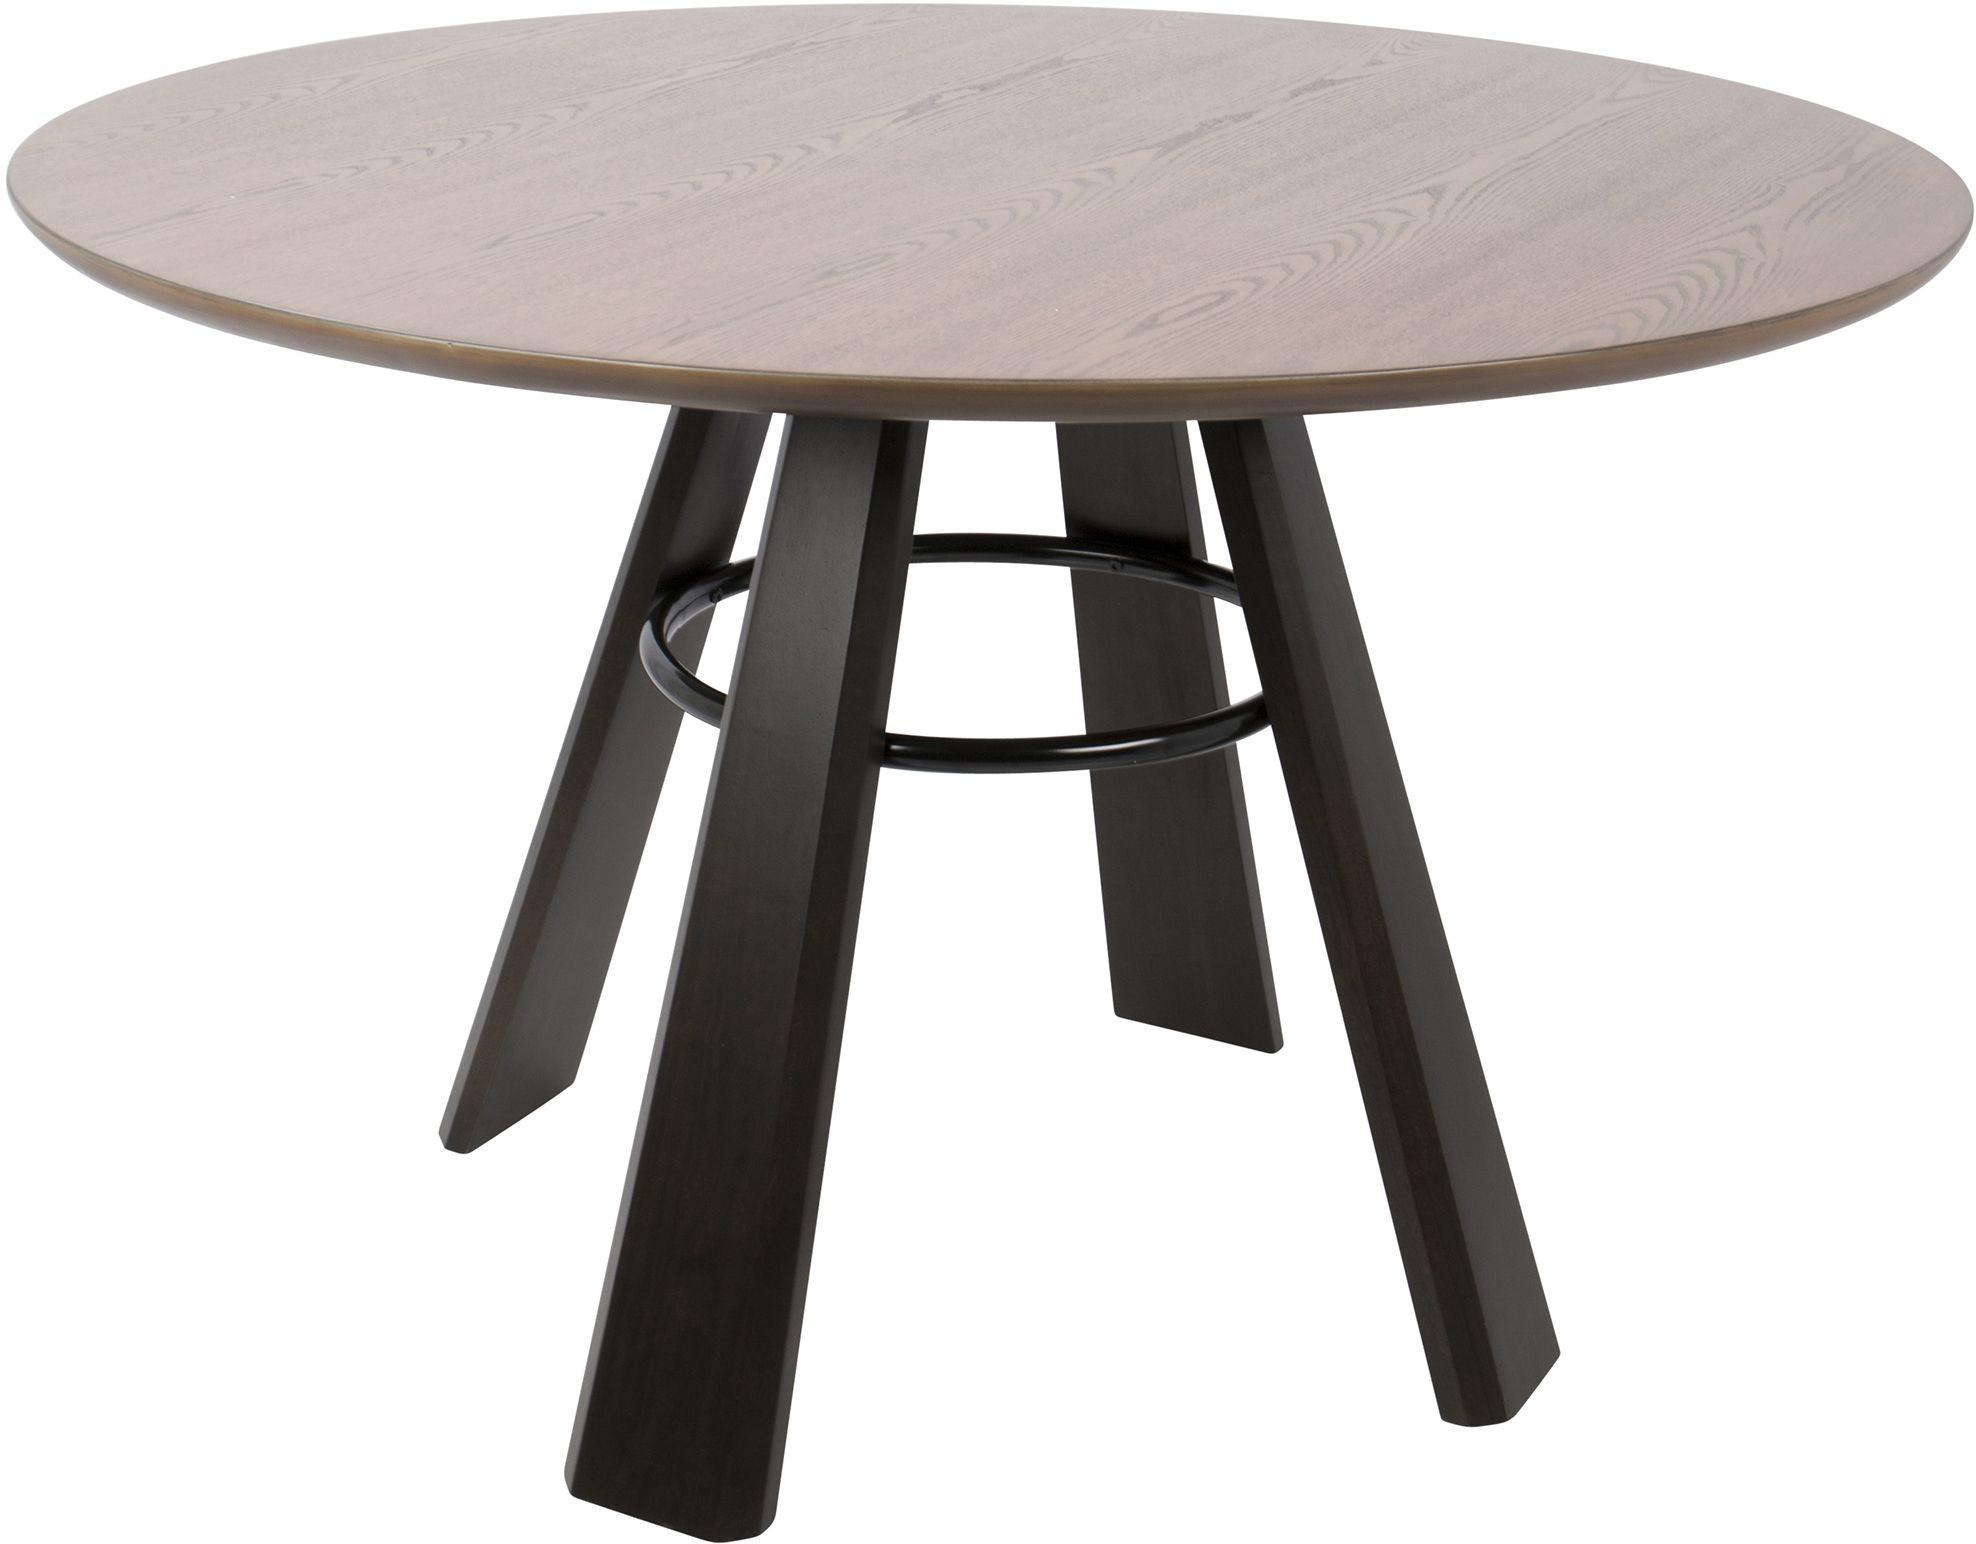 Elton walnut wood and espresso dining table from for Espresso dining table